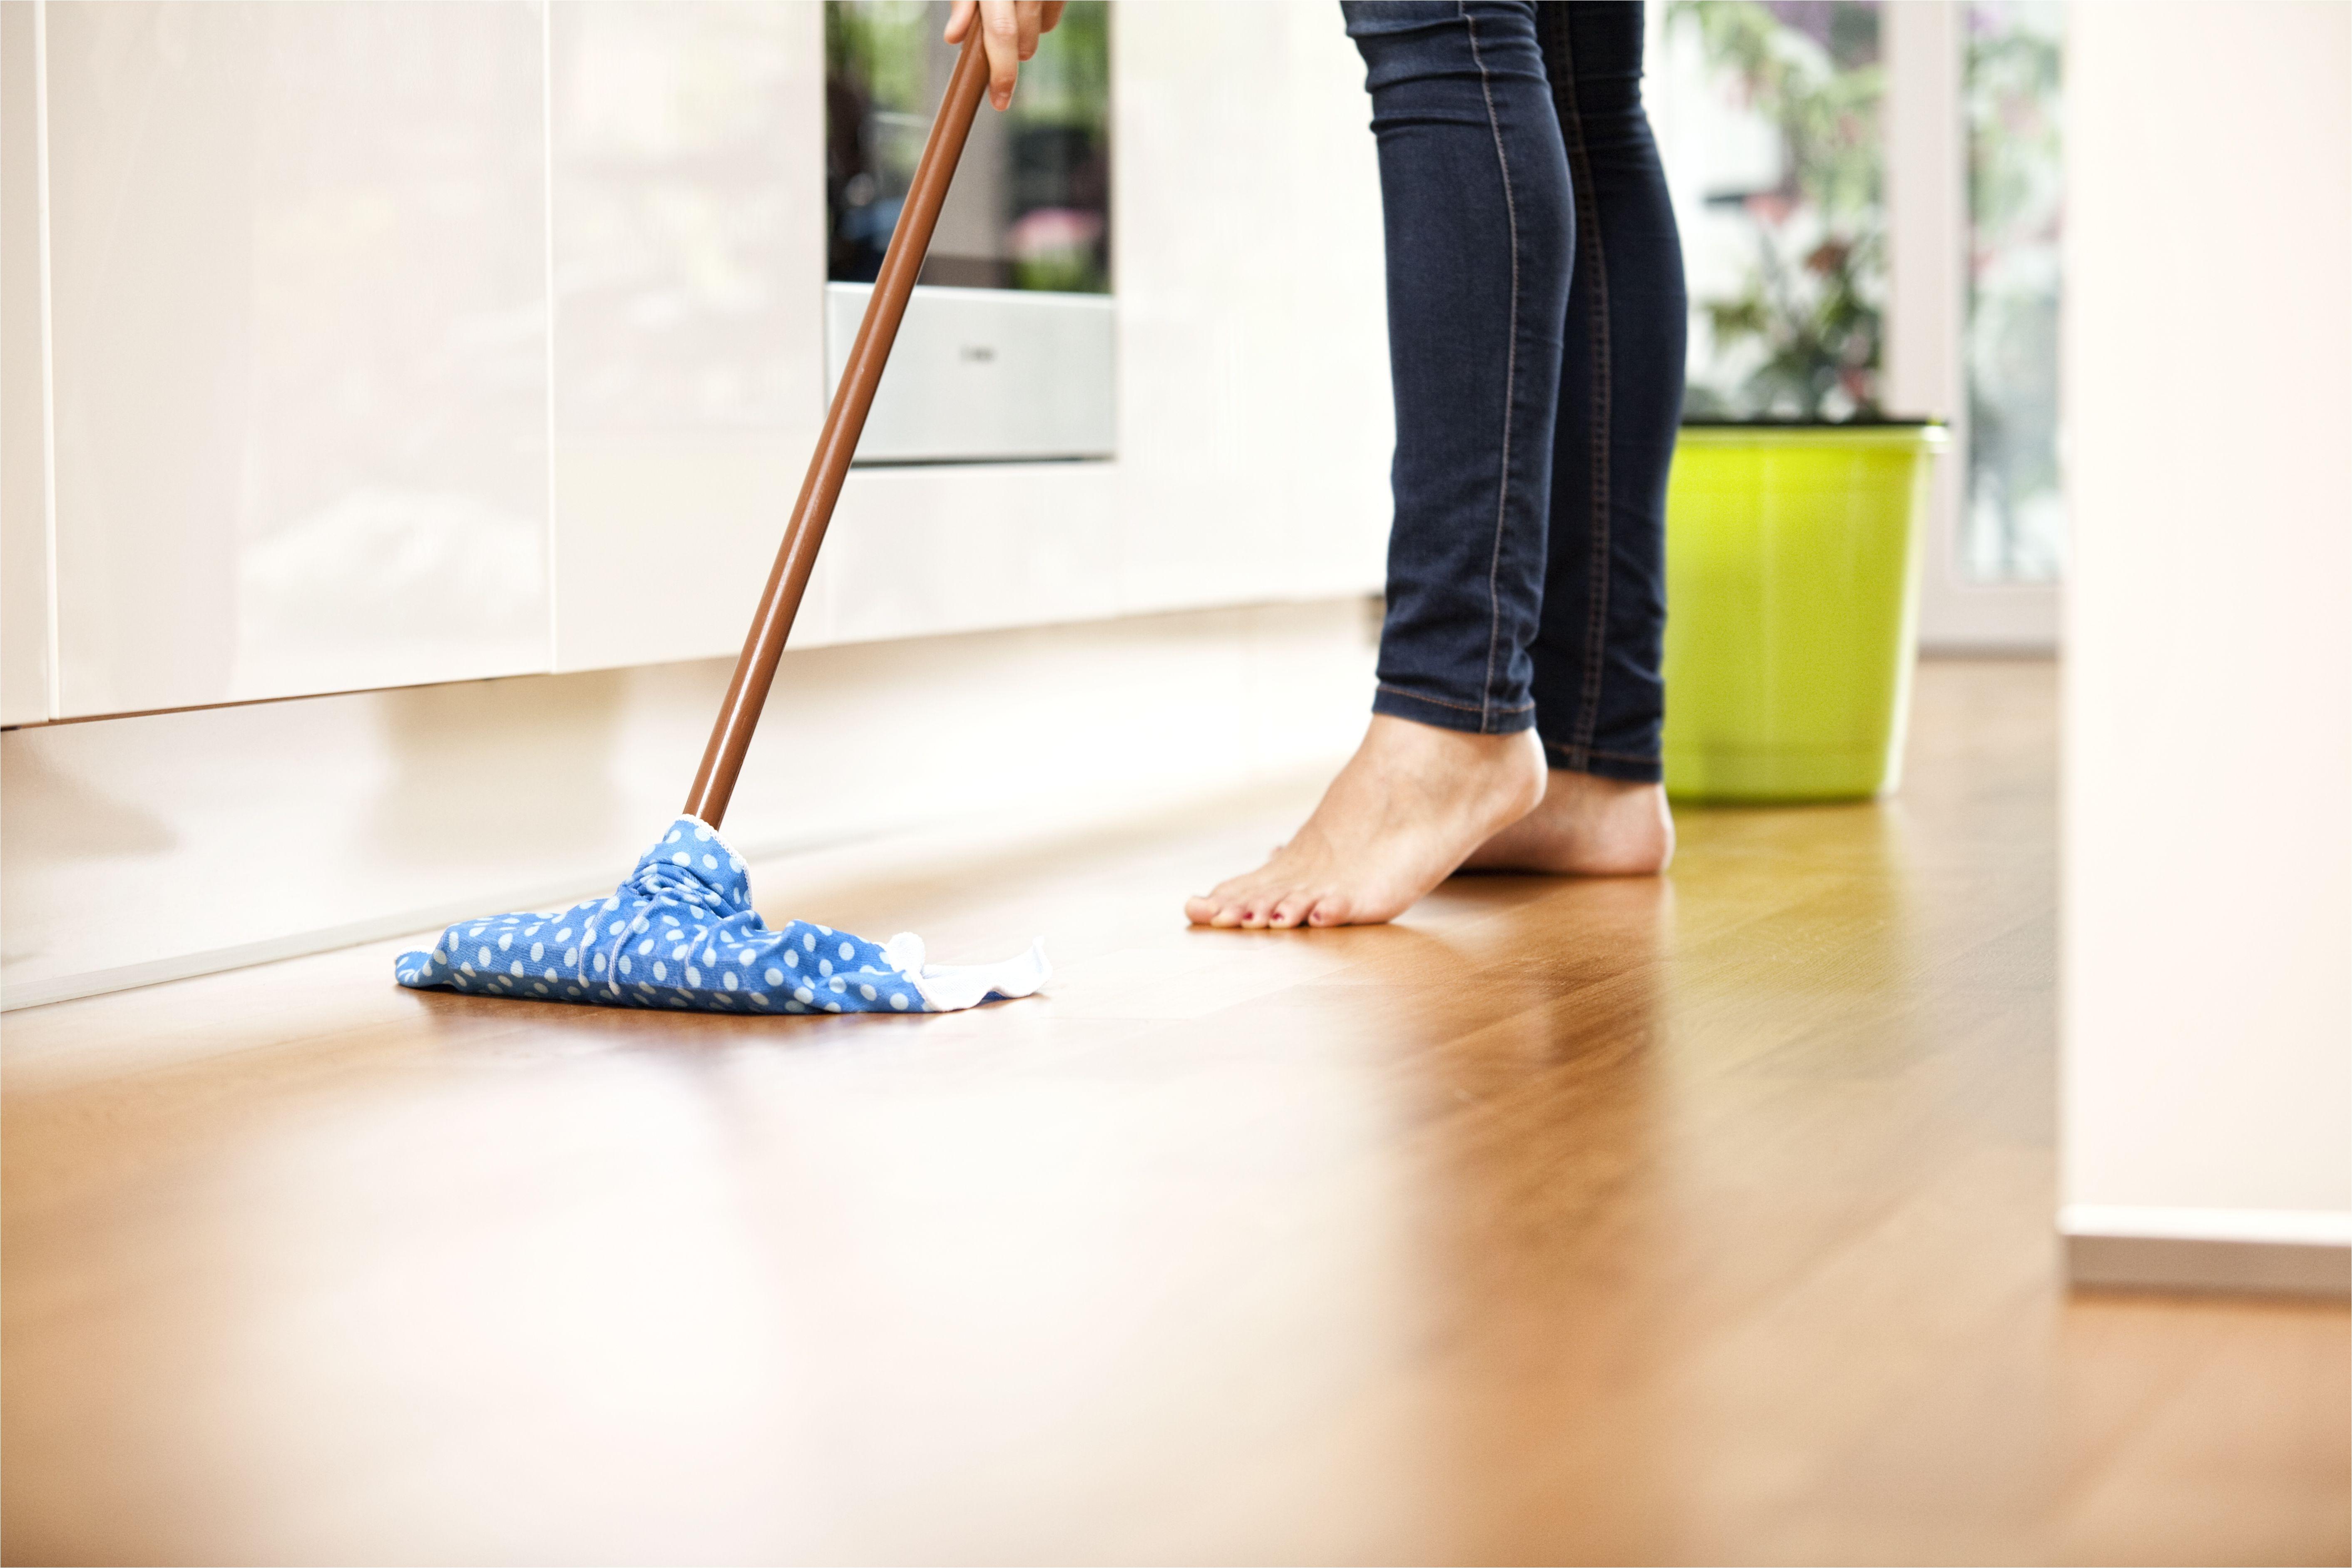 woman wiping the floor 588494585 585049b43df78c491ebc200a jpg